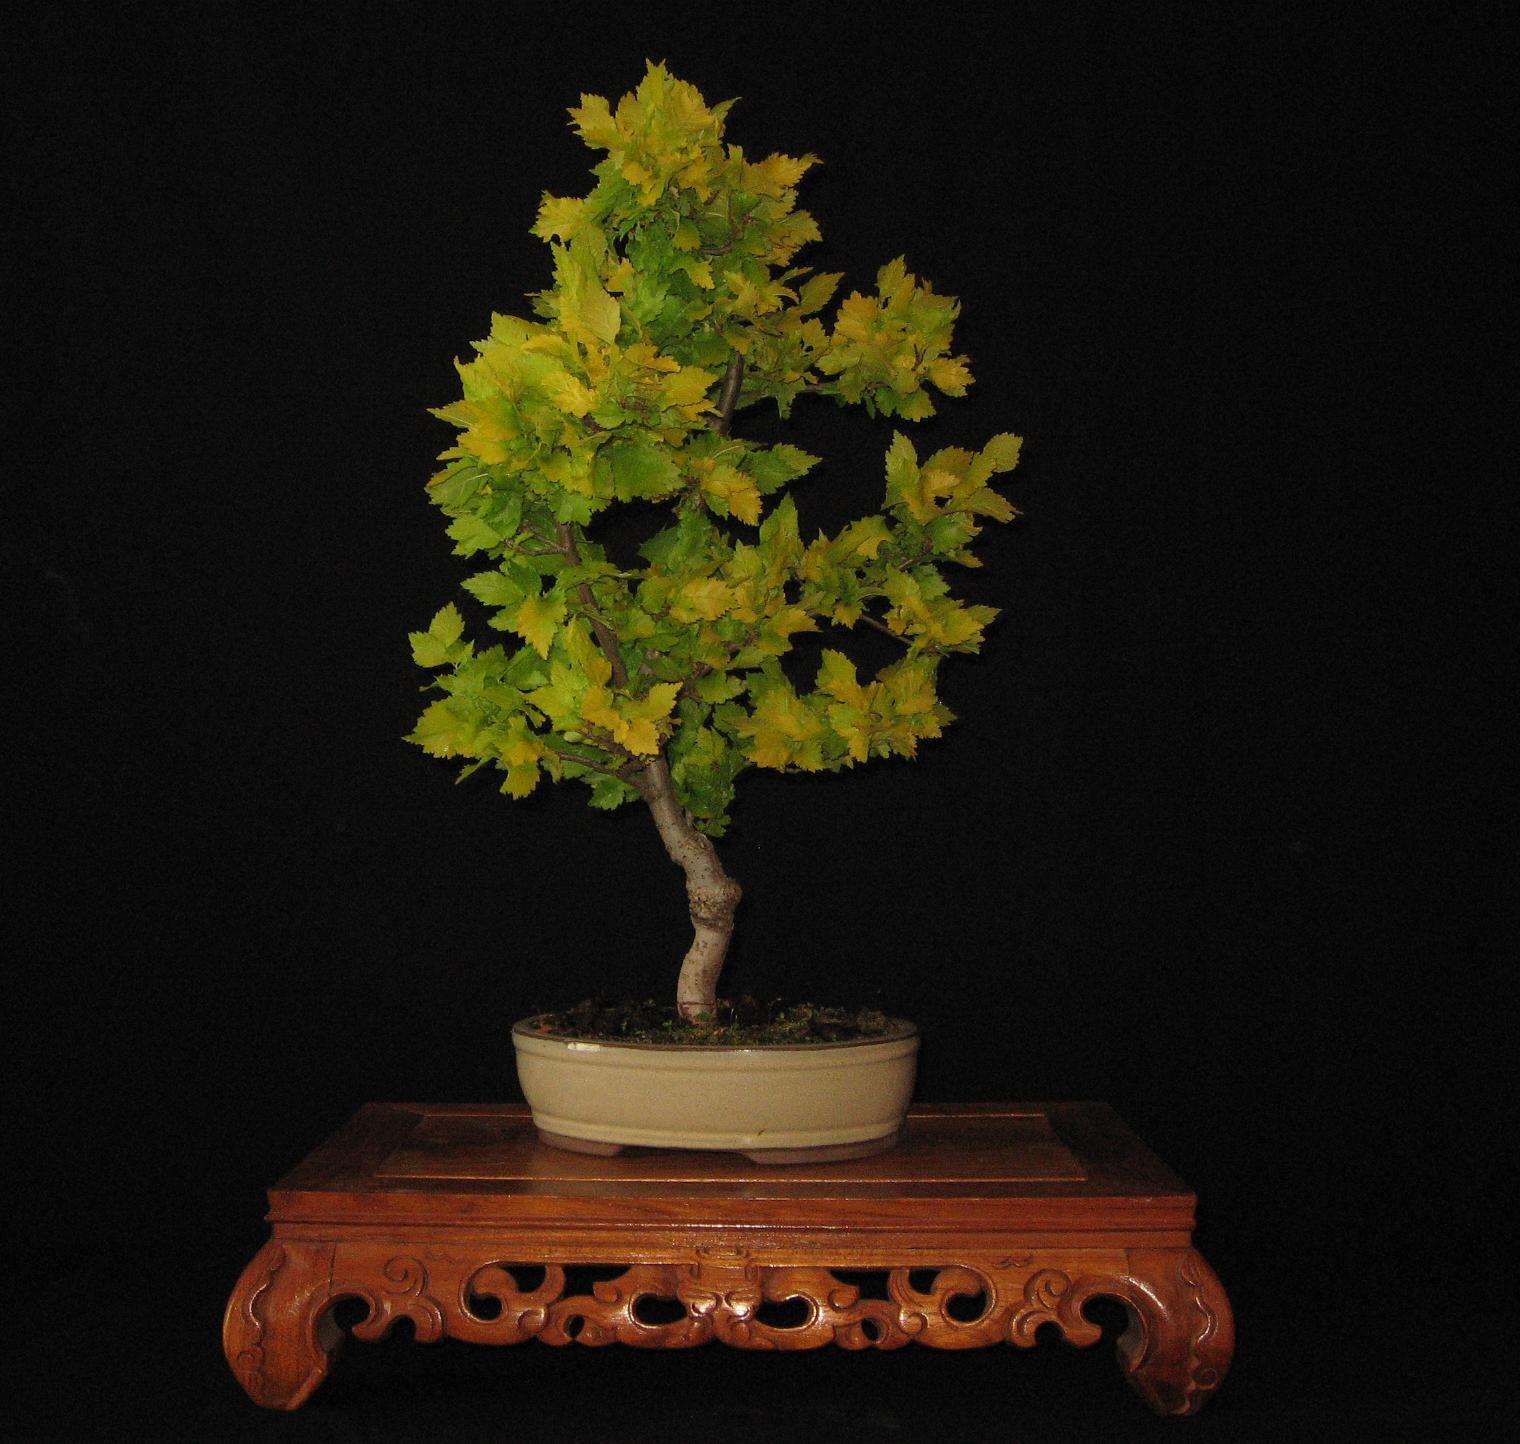 bonsai das sch nste hobby der welt ulmus carpinifolia wredei goldulme. Black Bedroom Furniture Sets. Home Design Ideas